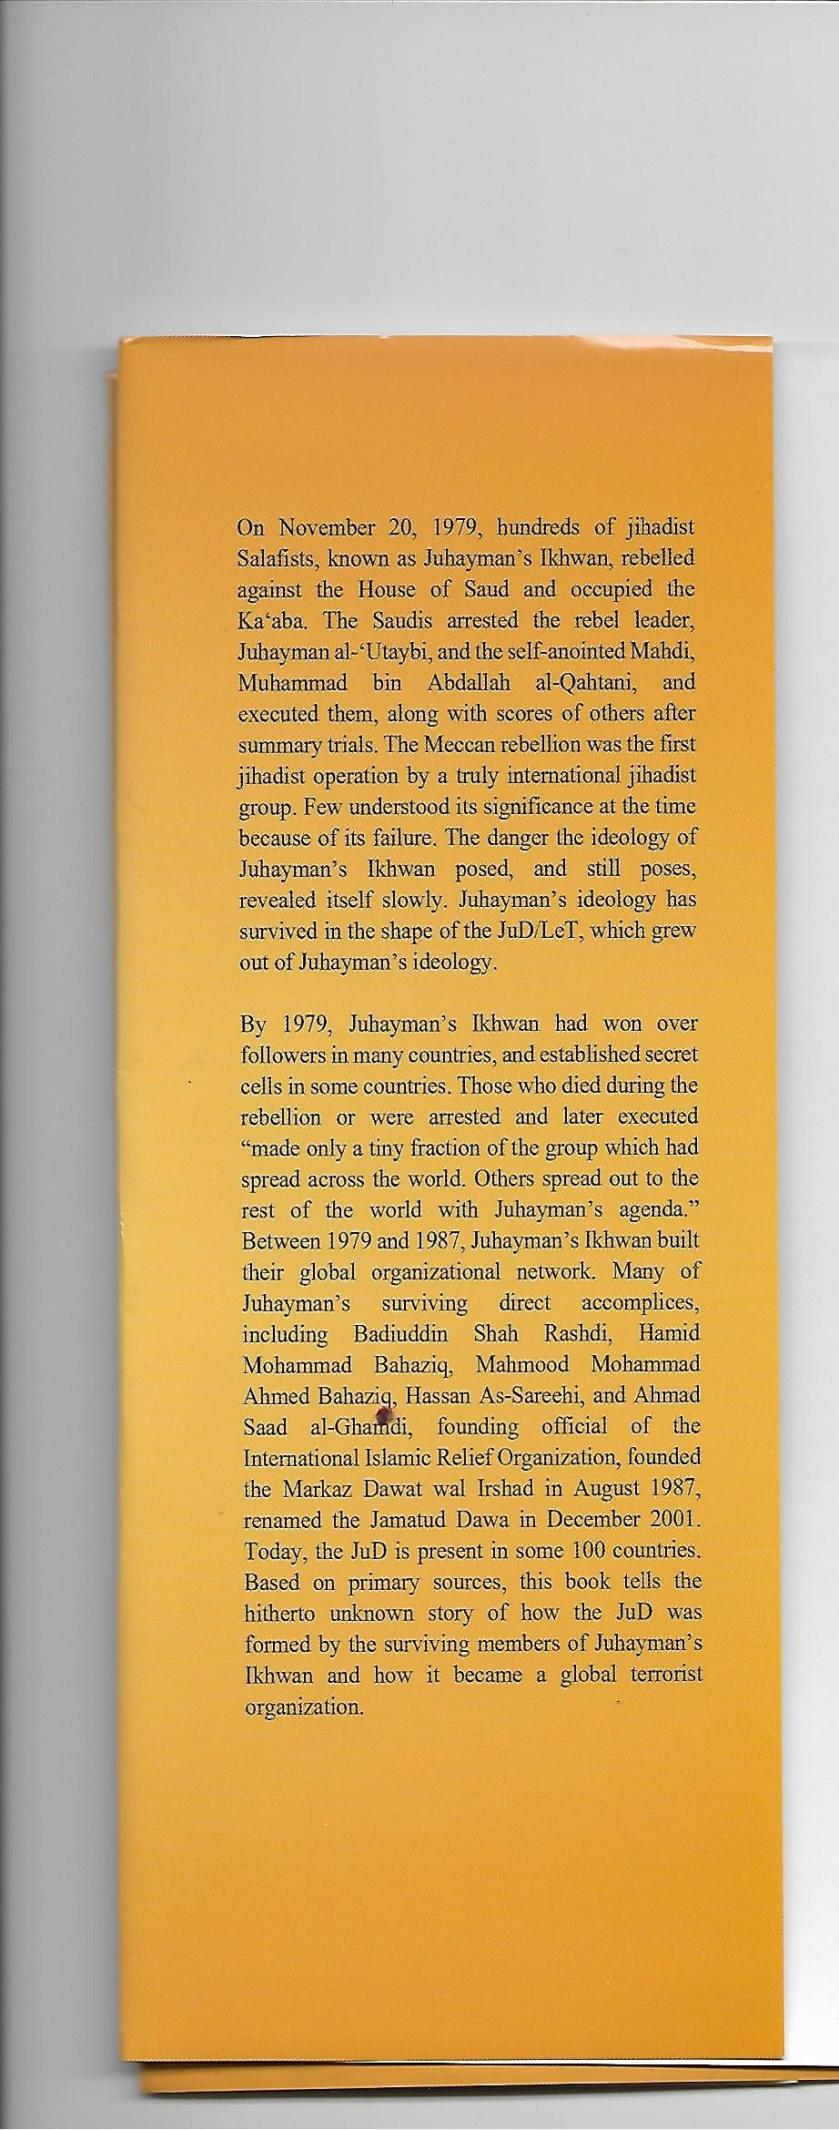 arif-jamal-book-jacket0003